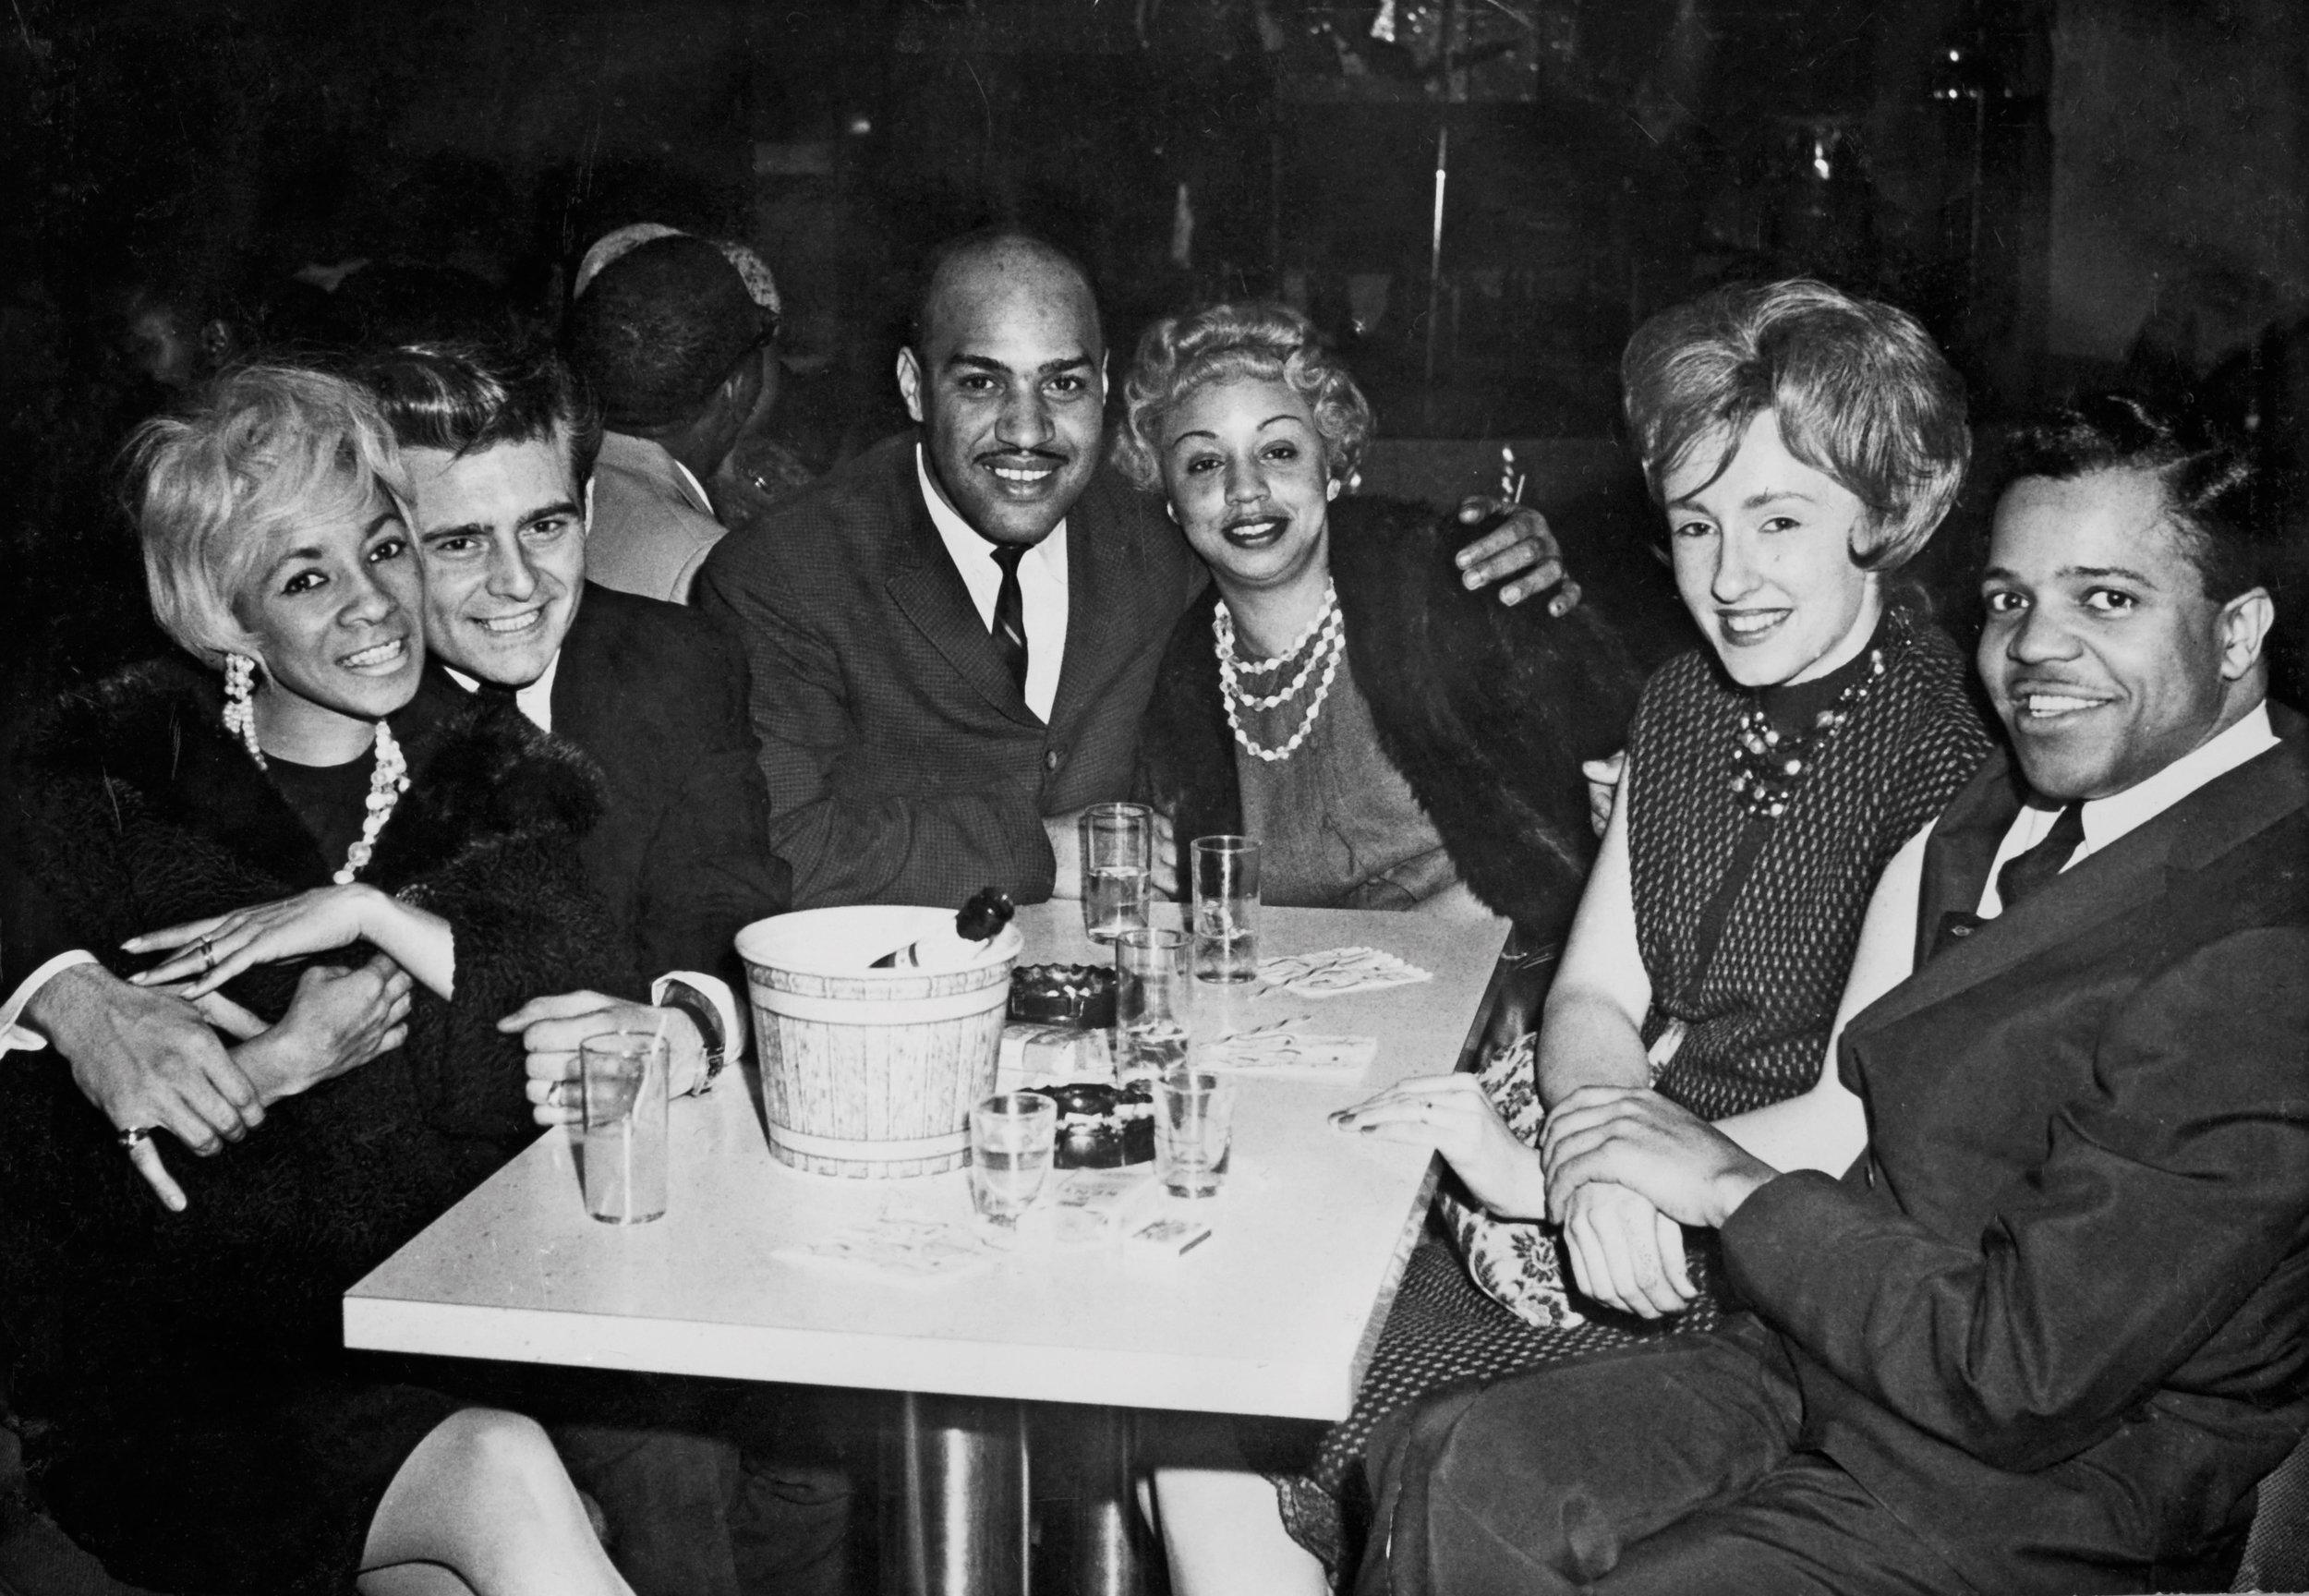 Saturday night in Detroit, circa 1960